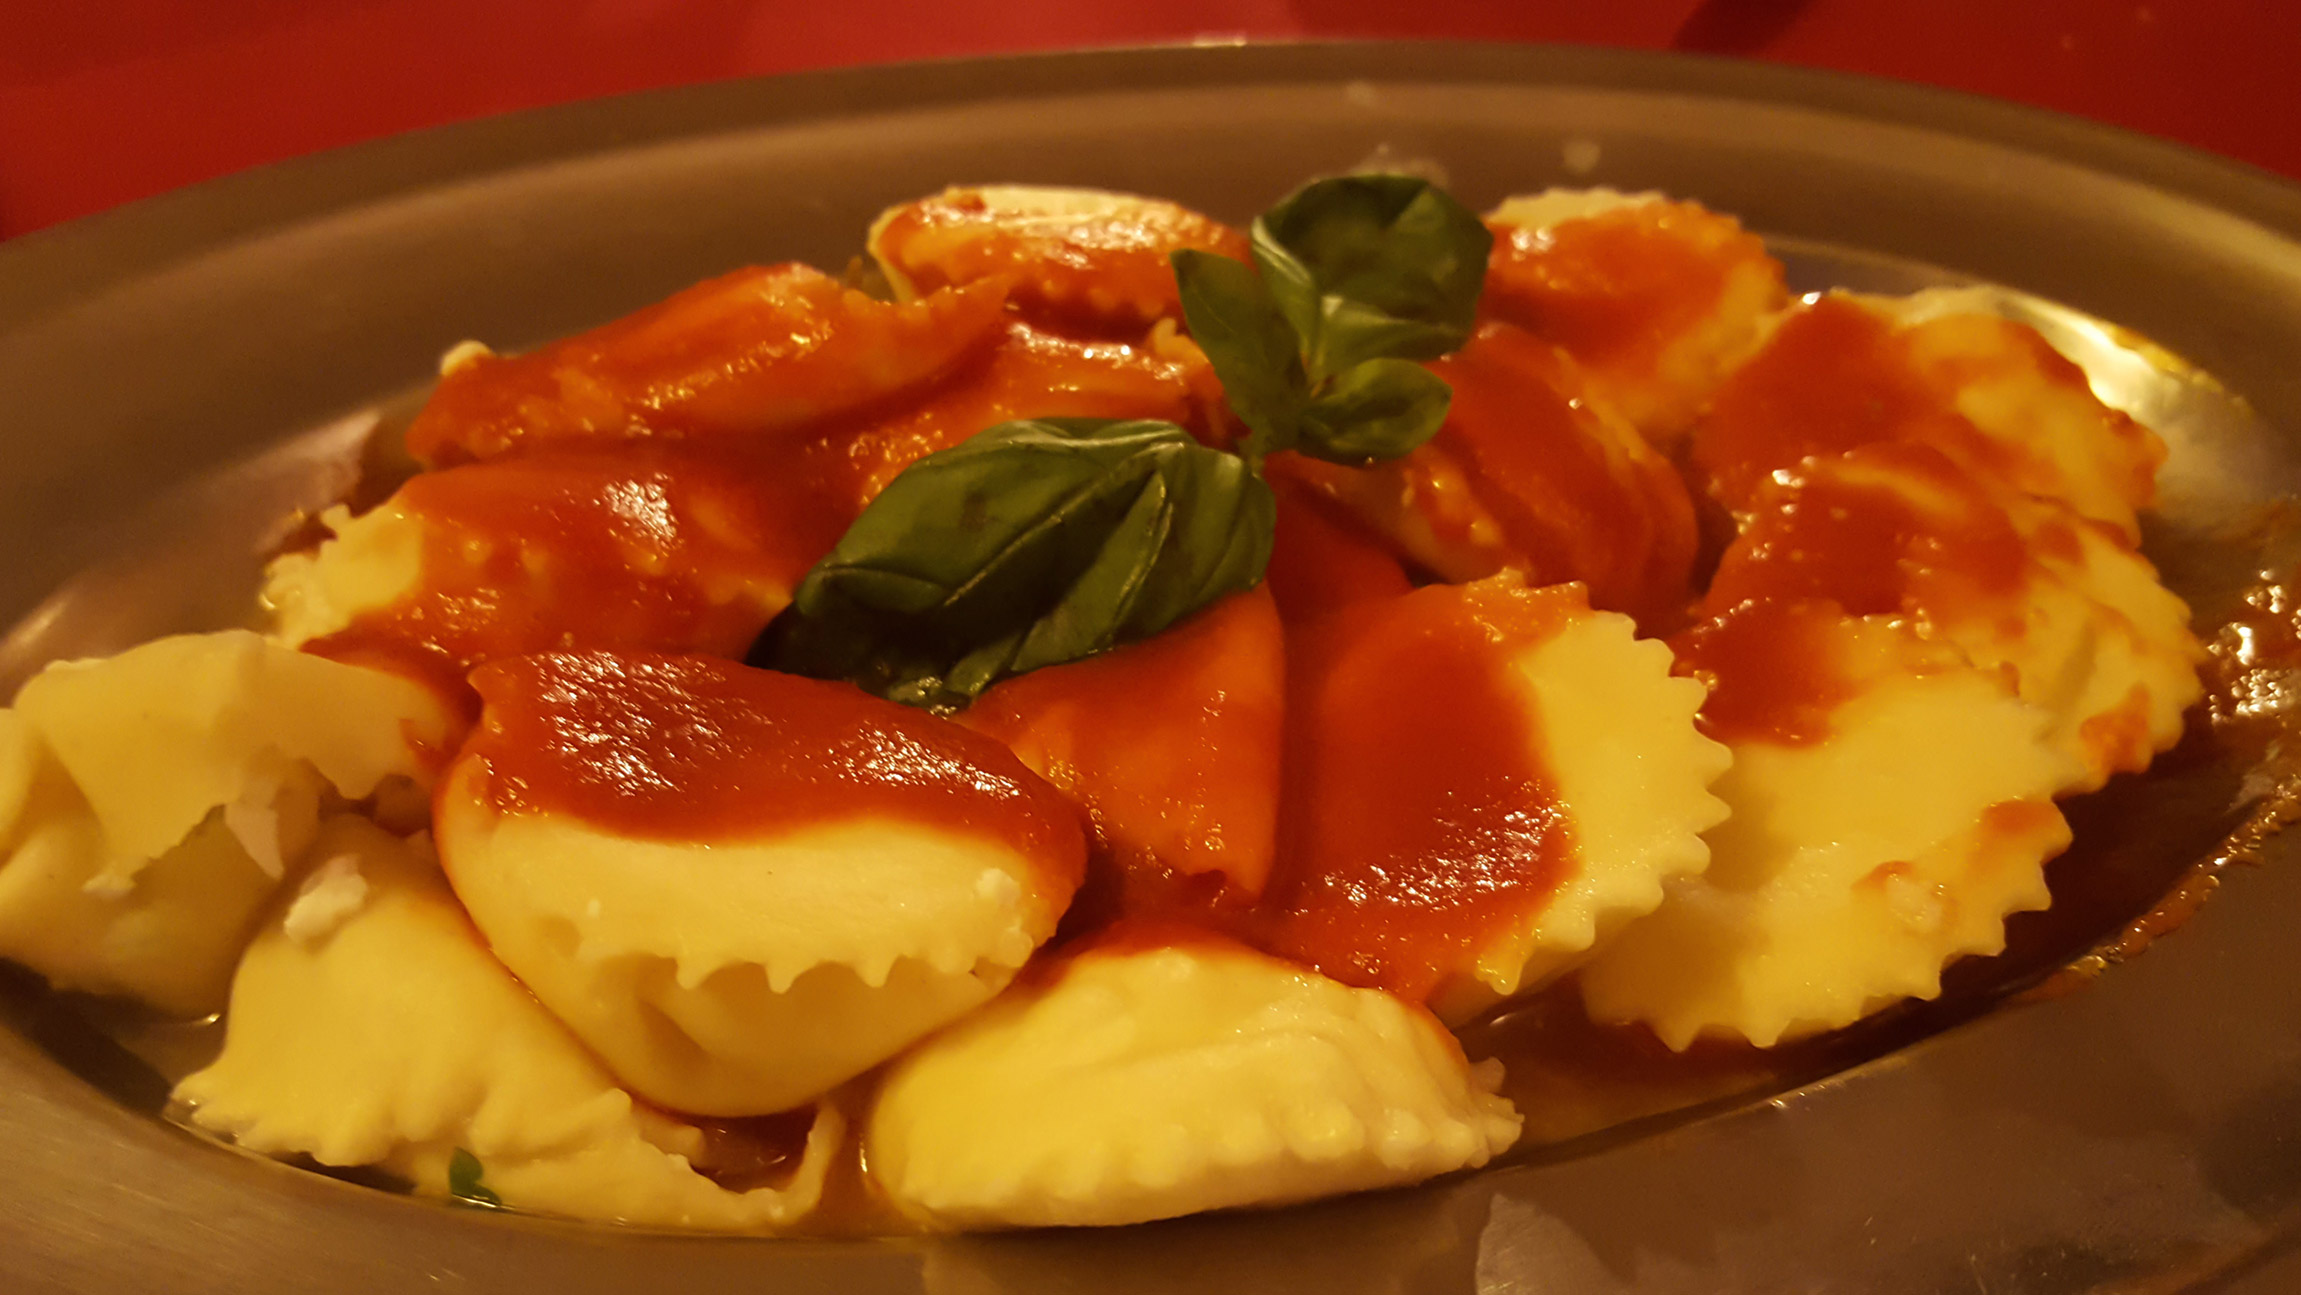 Cavajuóle (ravioli ripieni di ricotta dolce) - cosa mangiare in un weekend a Sant'Agata di Puglia